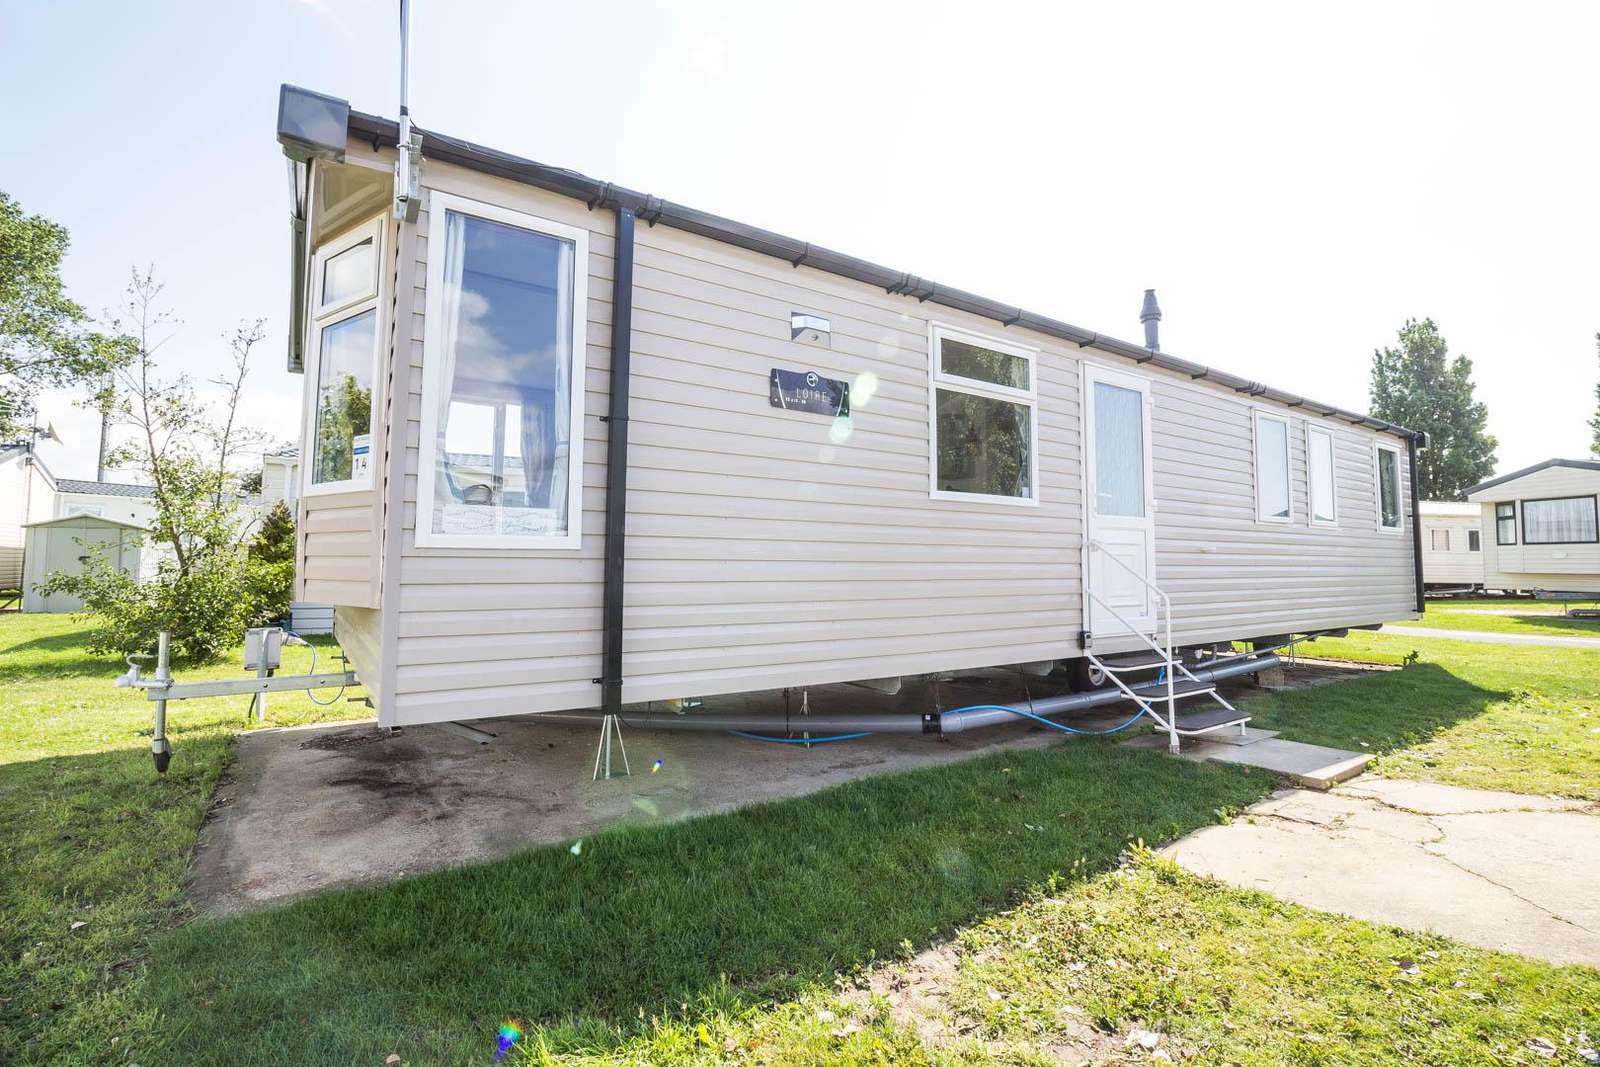 17014CC – Chorley Close area, 3 bed, 8 berth caravan. Diamond-Plus rated. - property